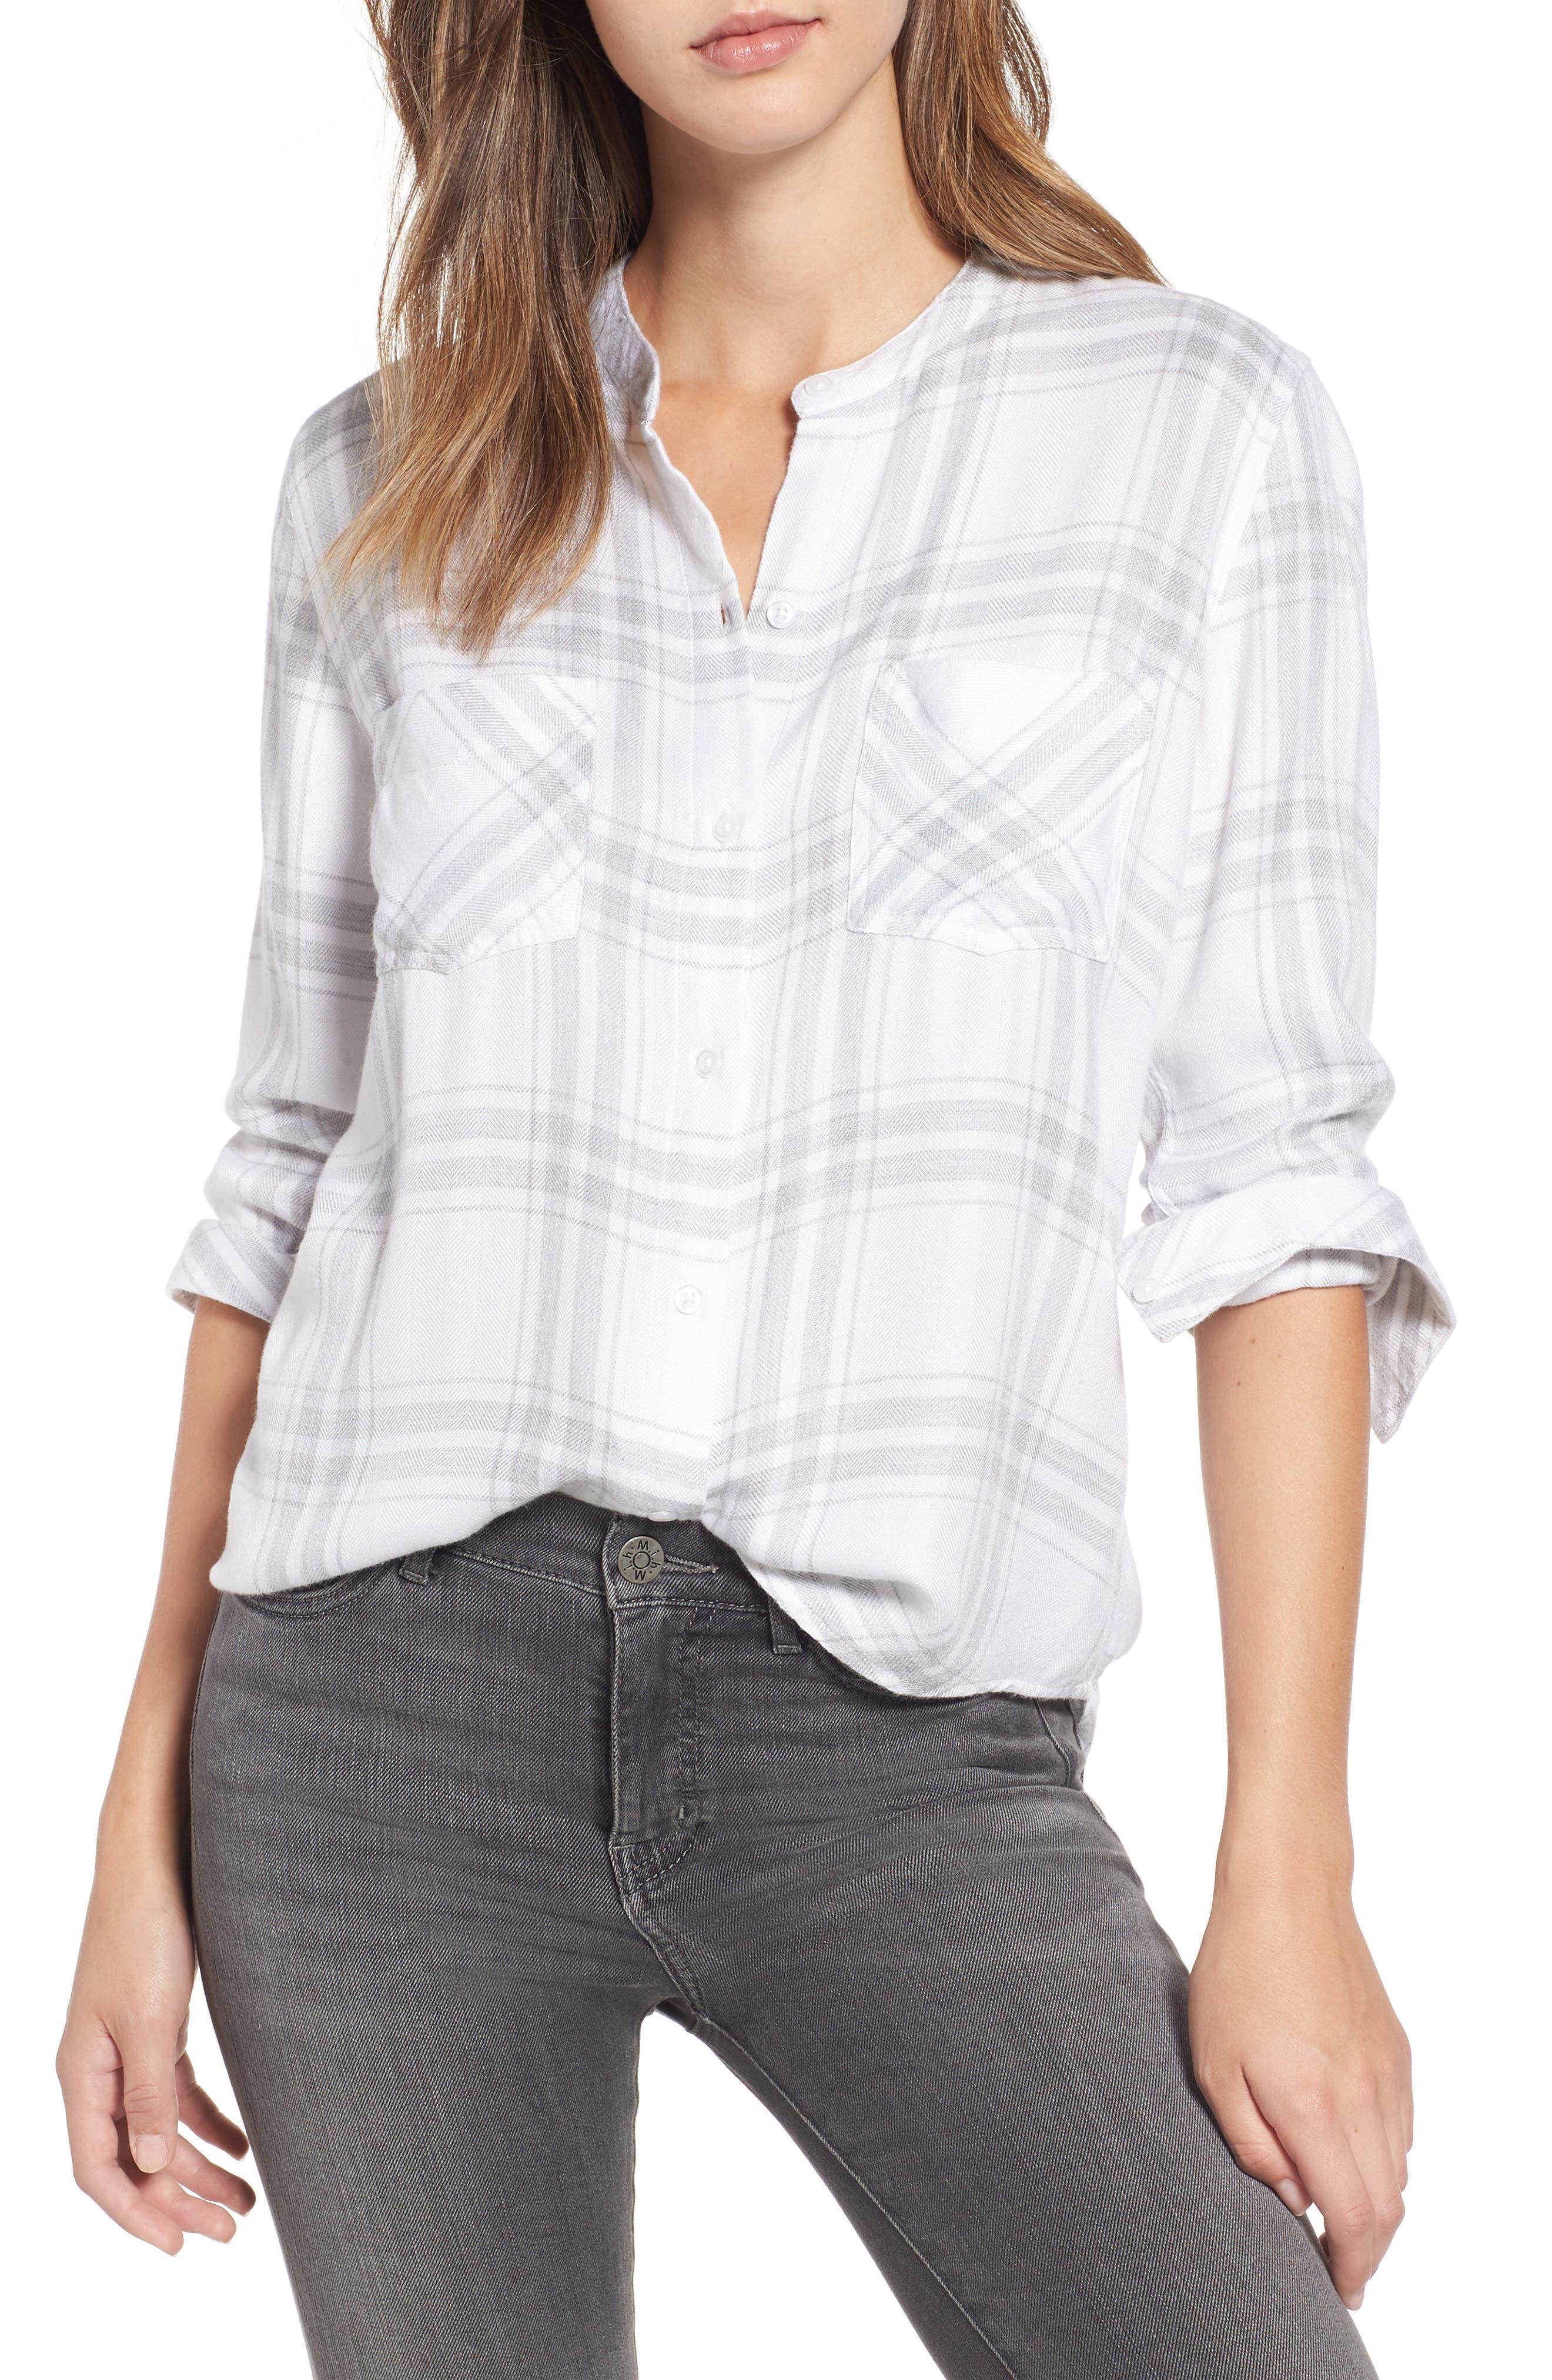 Allison Plaid Shirt,                             Main thumbnail 1, color,                             WHITE SILVER